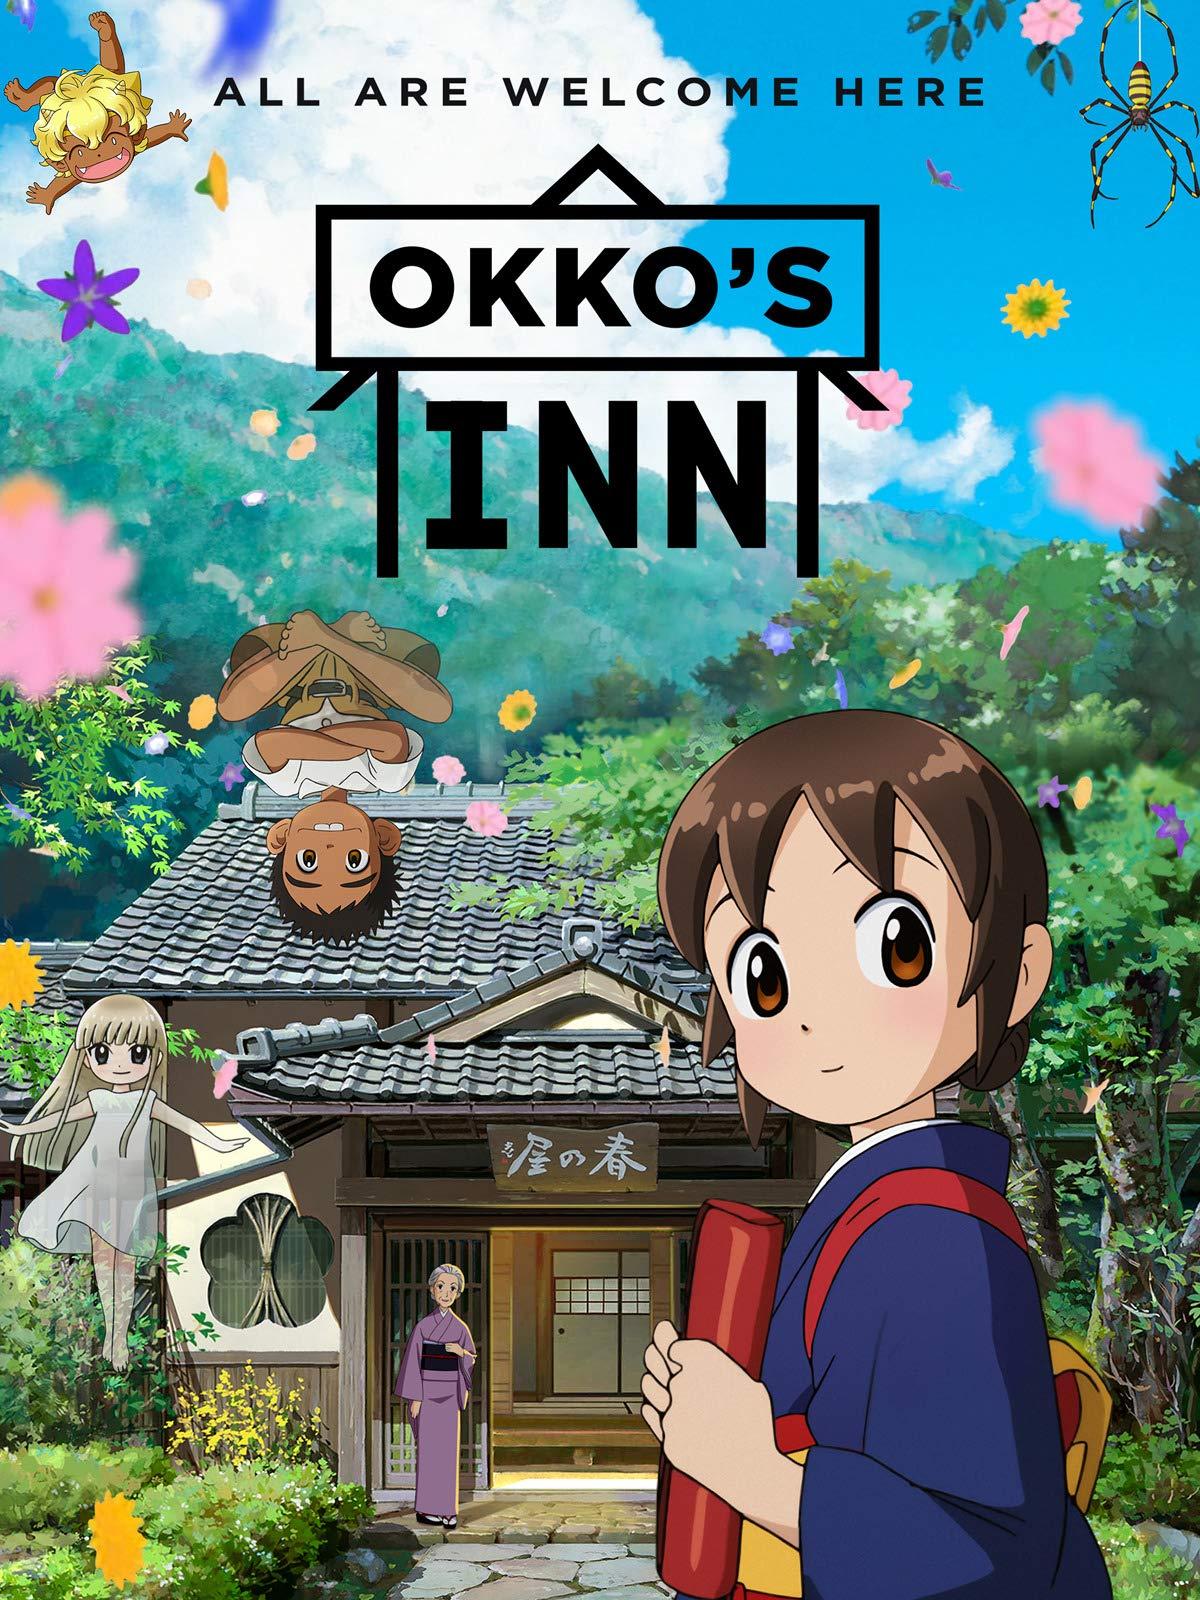 Watch Okkos Inn | Prime Video